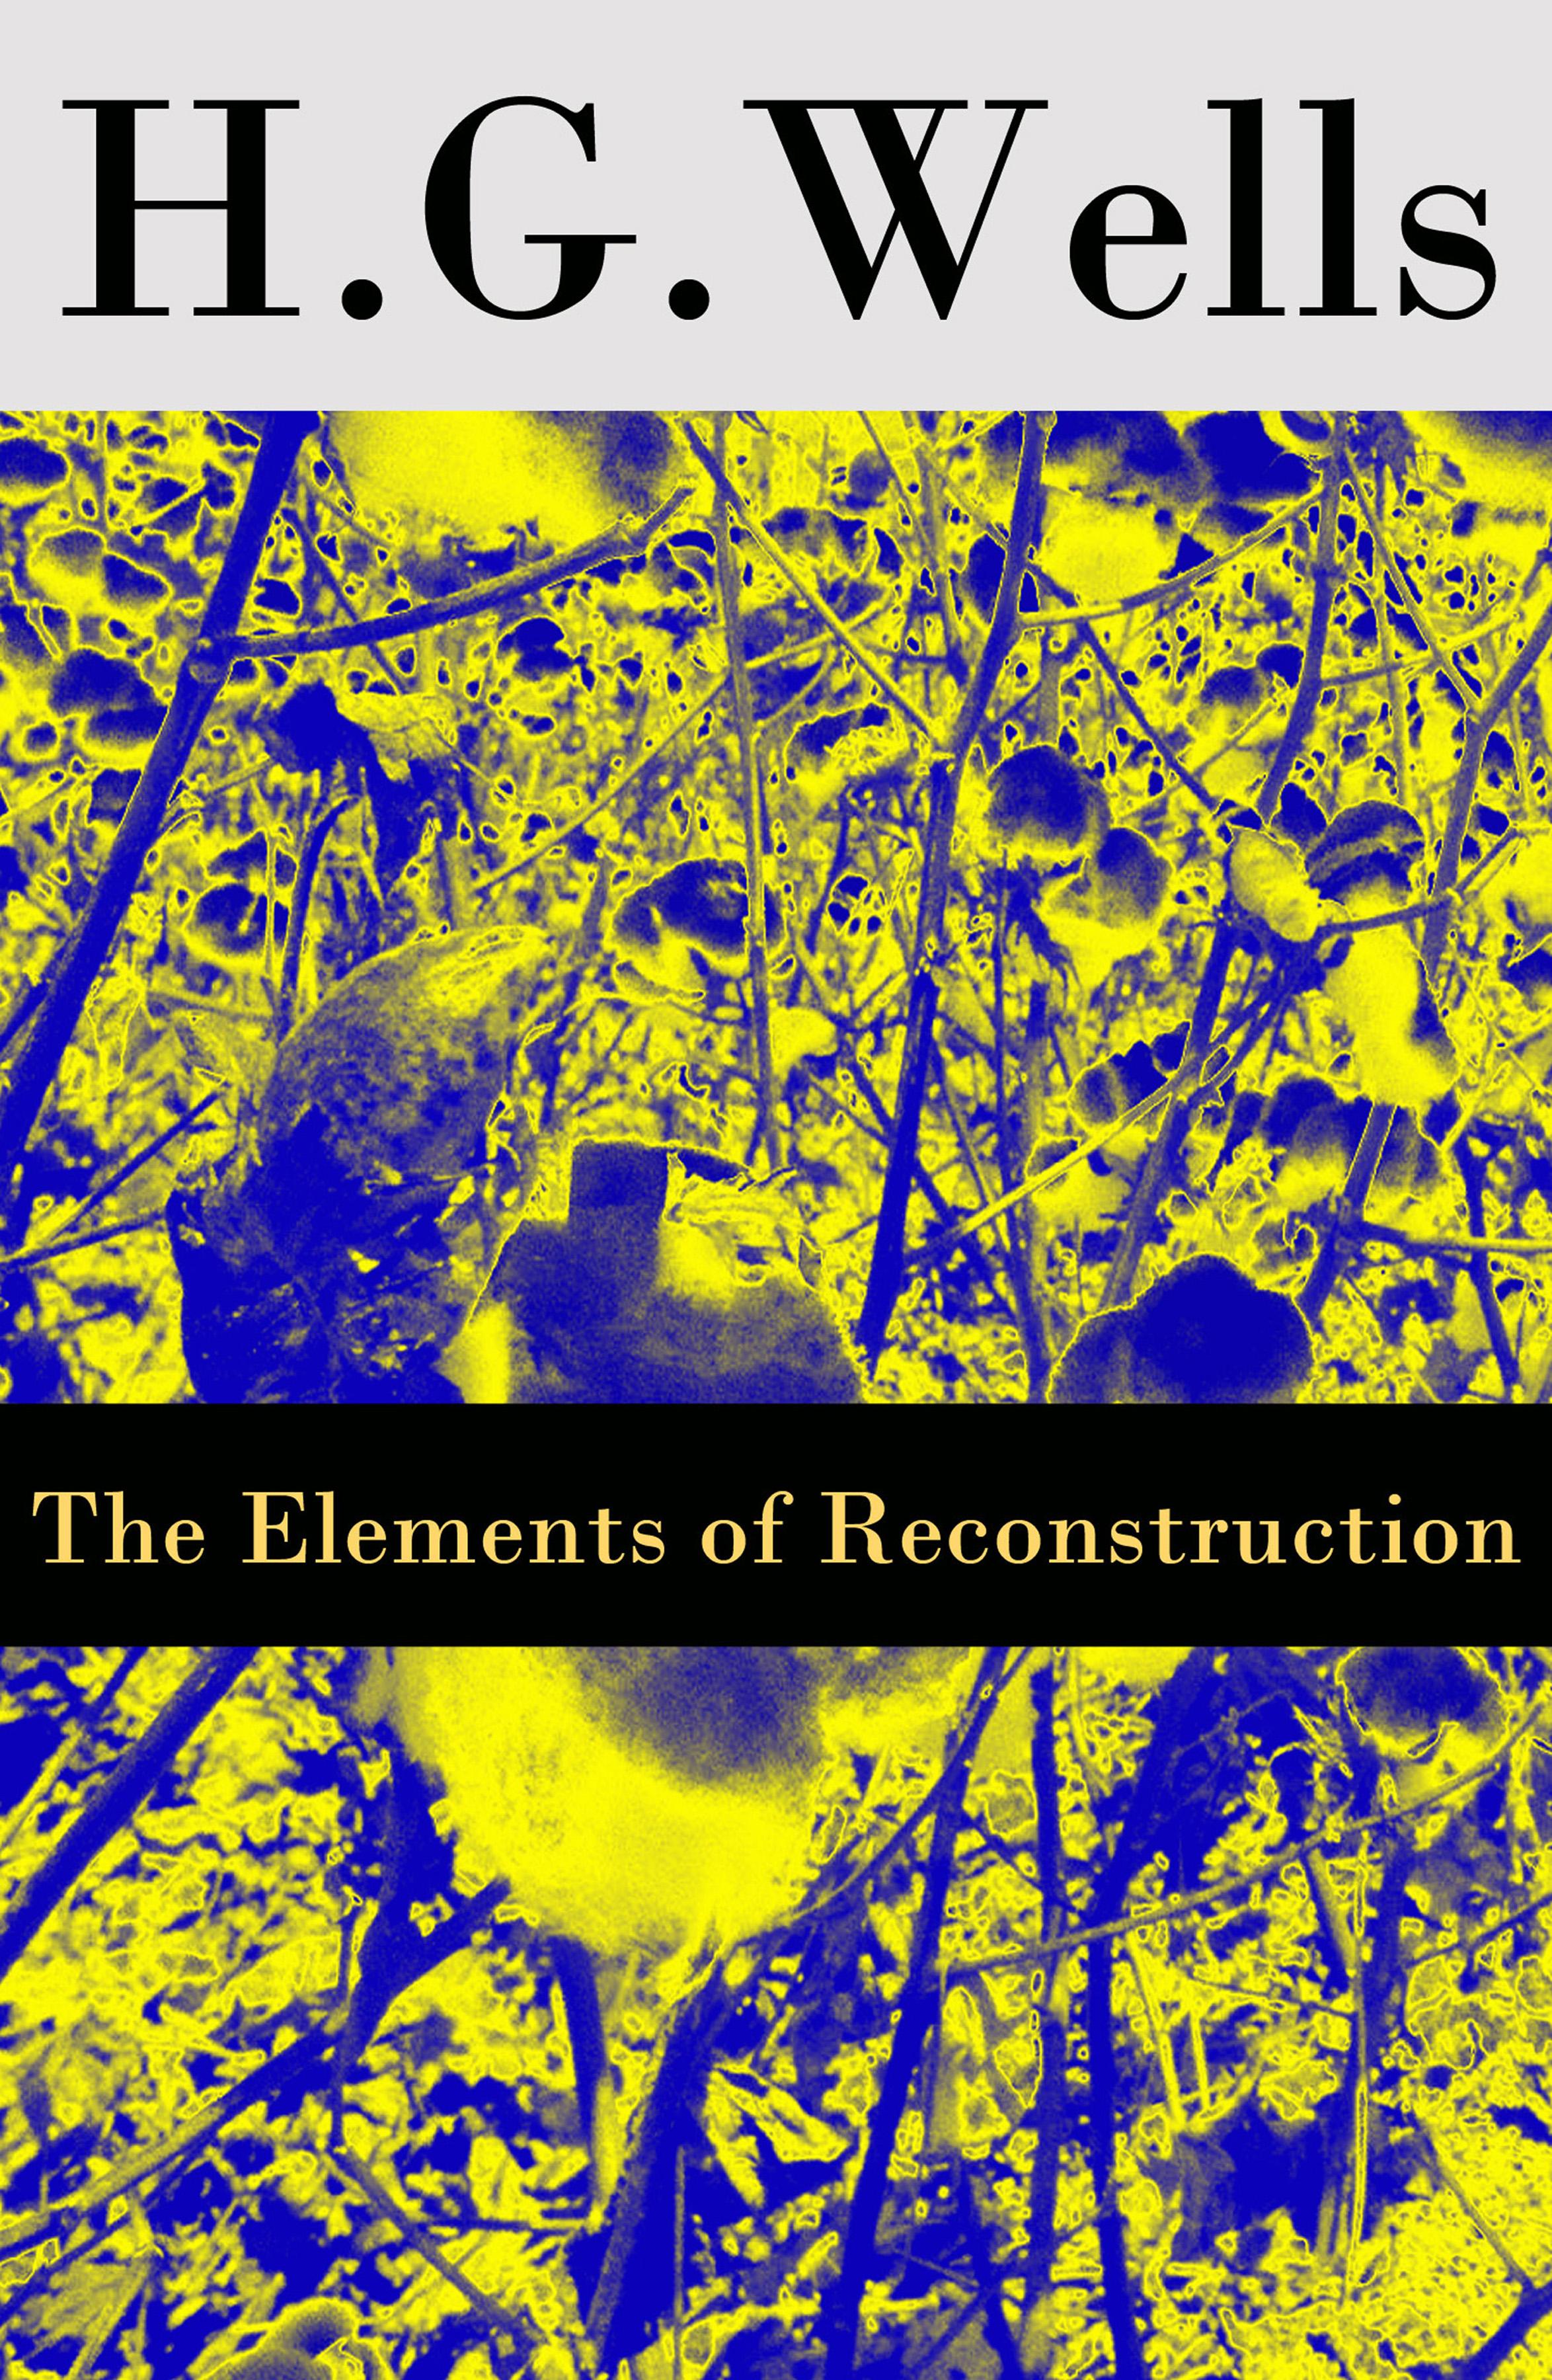 Герберт Уэллс The Elements of Reconstruction (The original unabridged edition) герберт уэллс this misery of boots or socialism means revolution the original unabridged edition